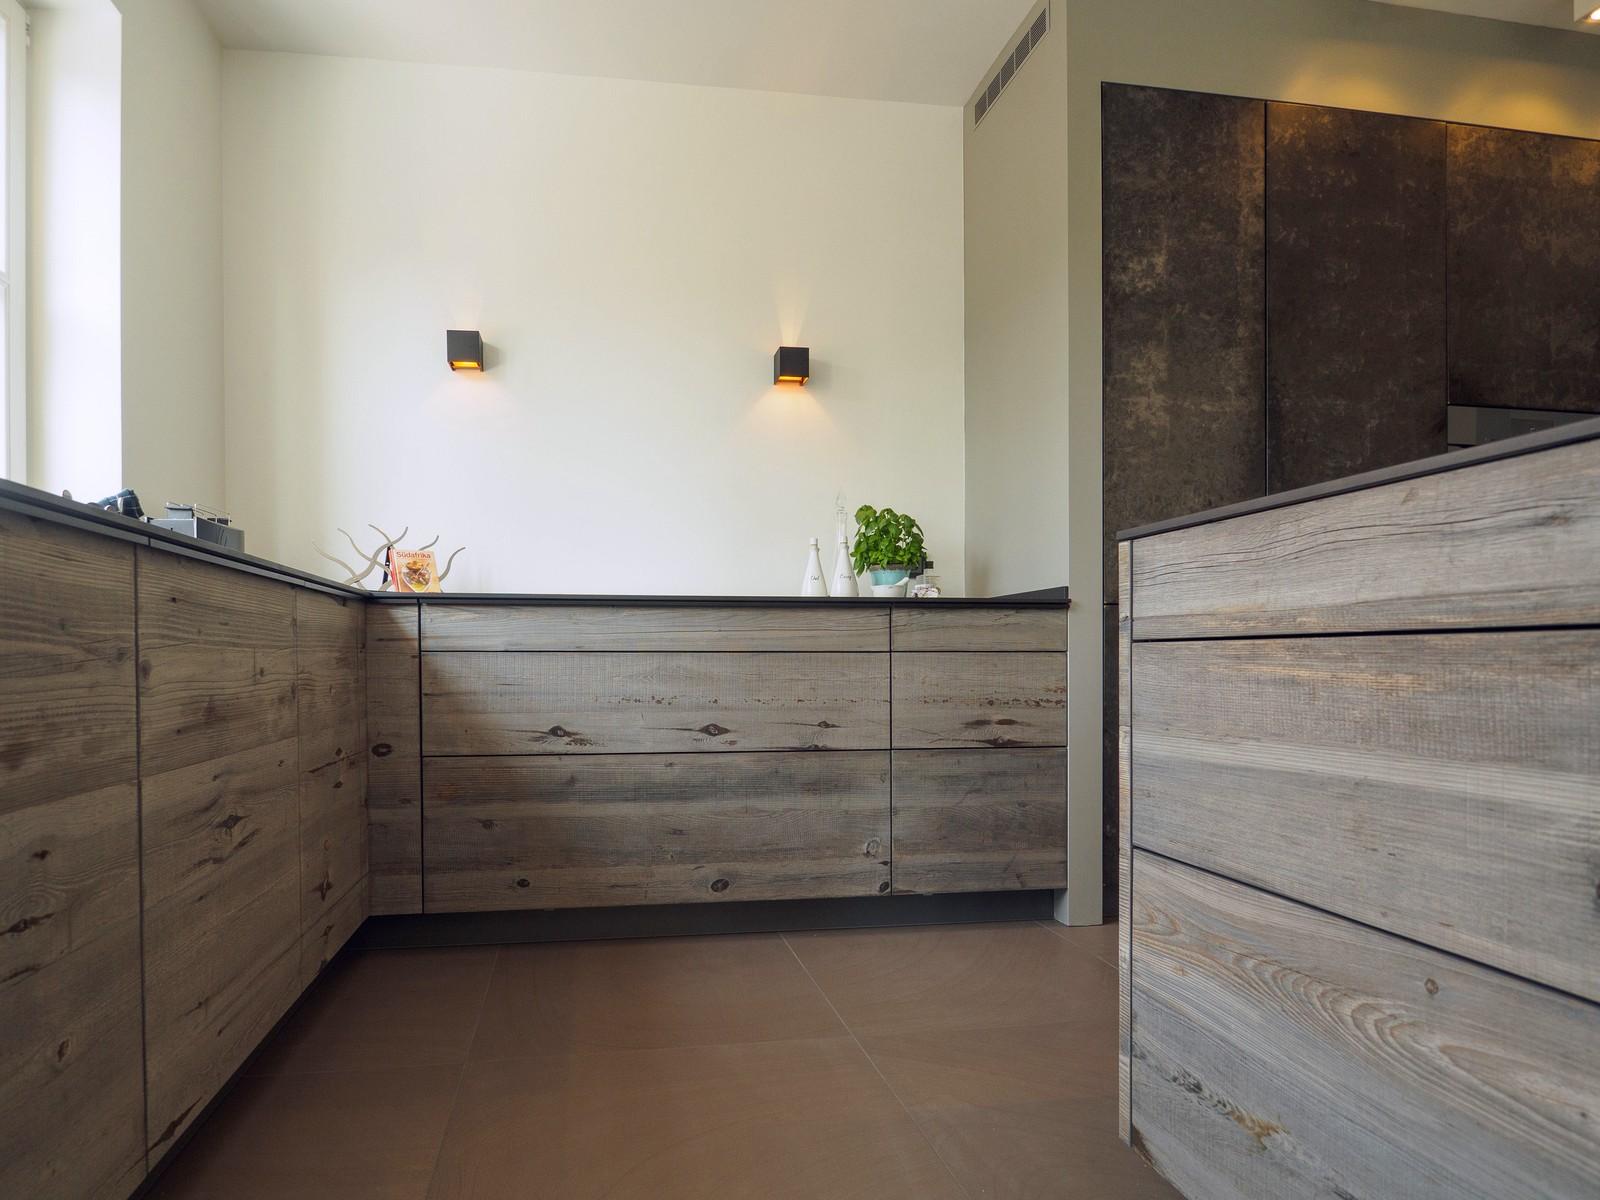 Kueche Exklusiv Design Fronten Holz Furnier Sonnenverbrannt Stahl Keramik Arbeitsplatte Miele 13